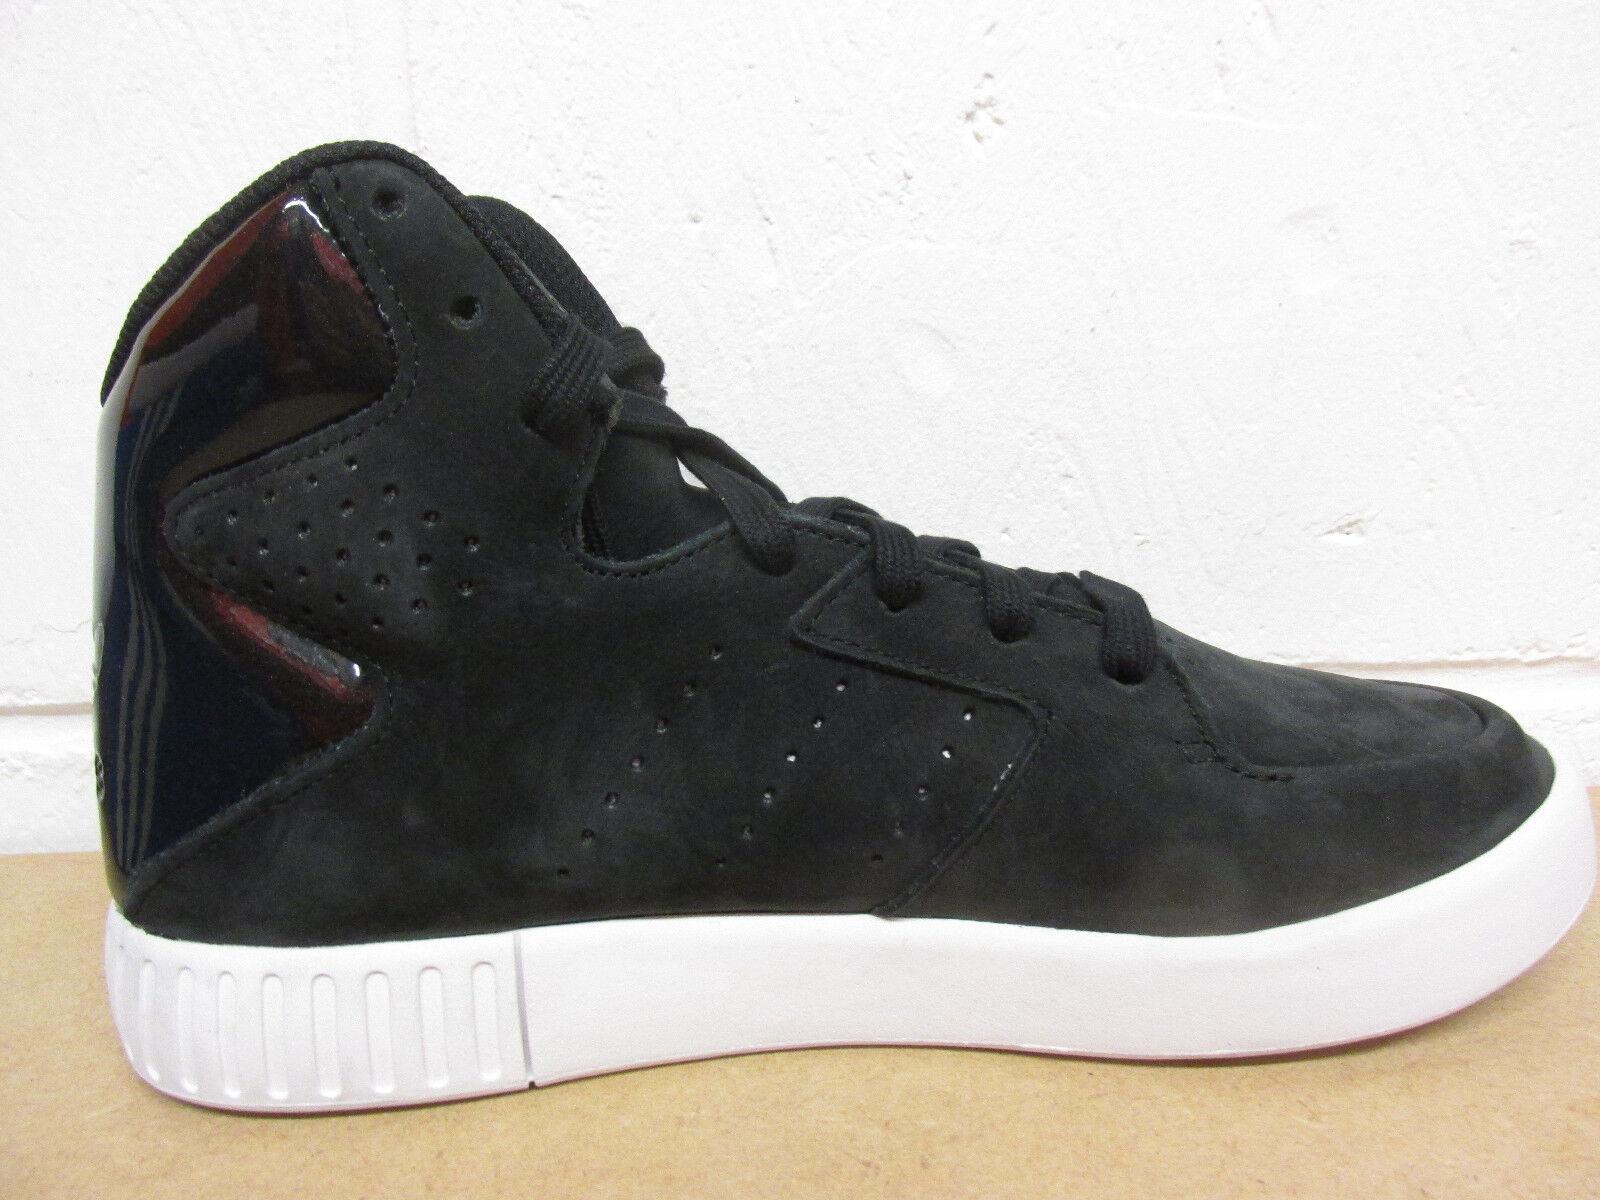 Adidas Sneakers Schlauch Eindringling 2.0 Damen BA7508 Hi Top Turnschuhe Sneakers Adidas cad44d